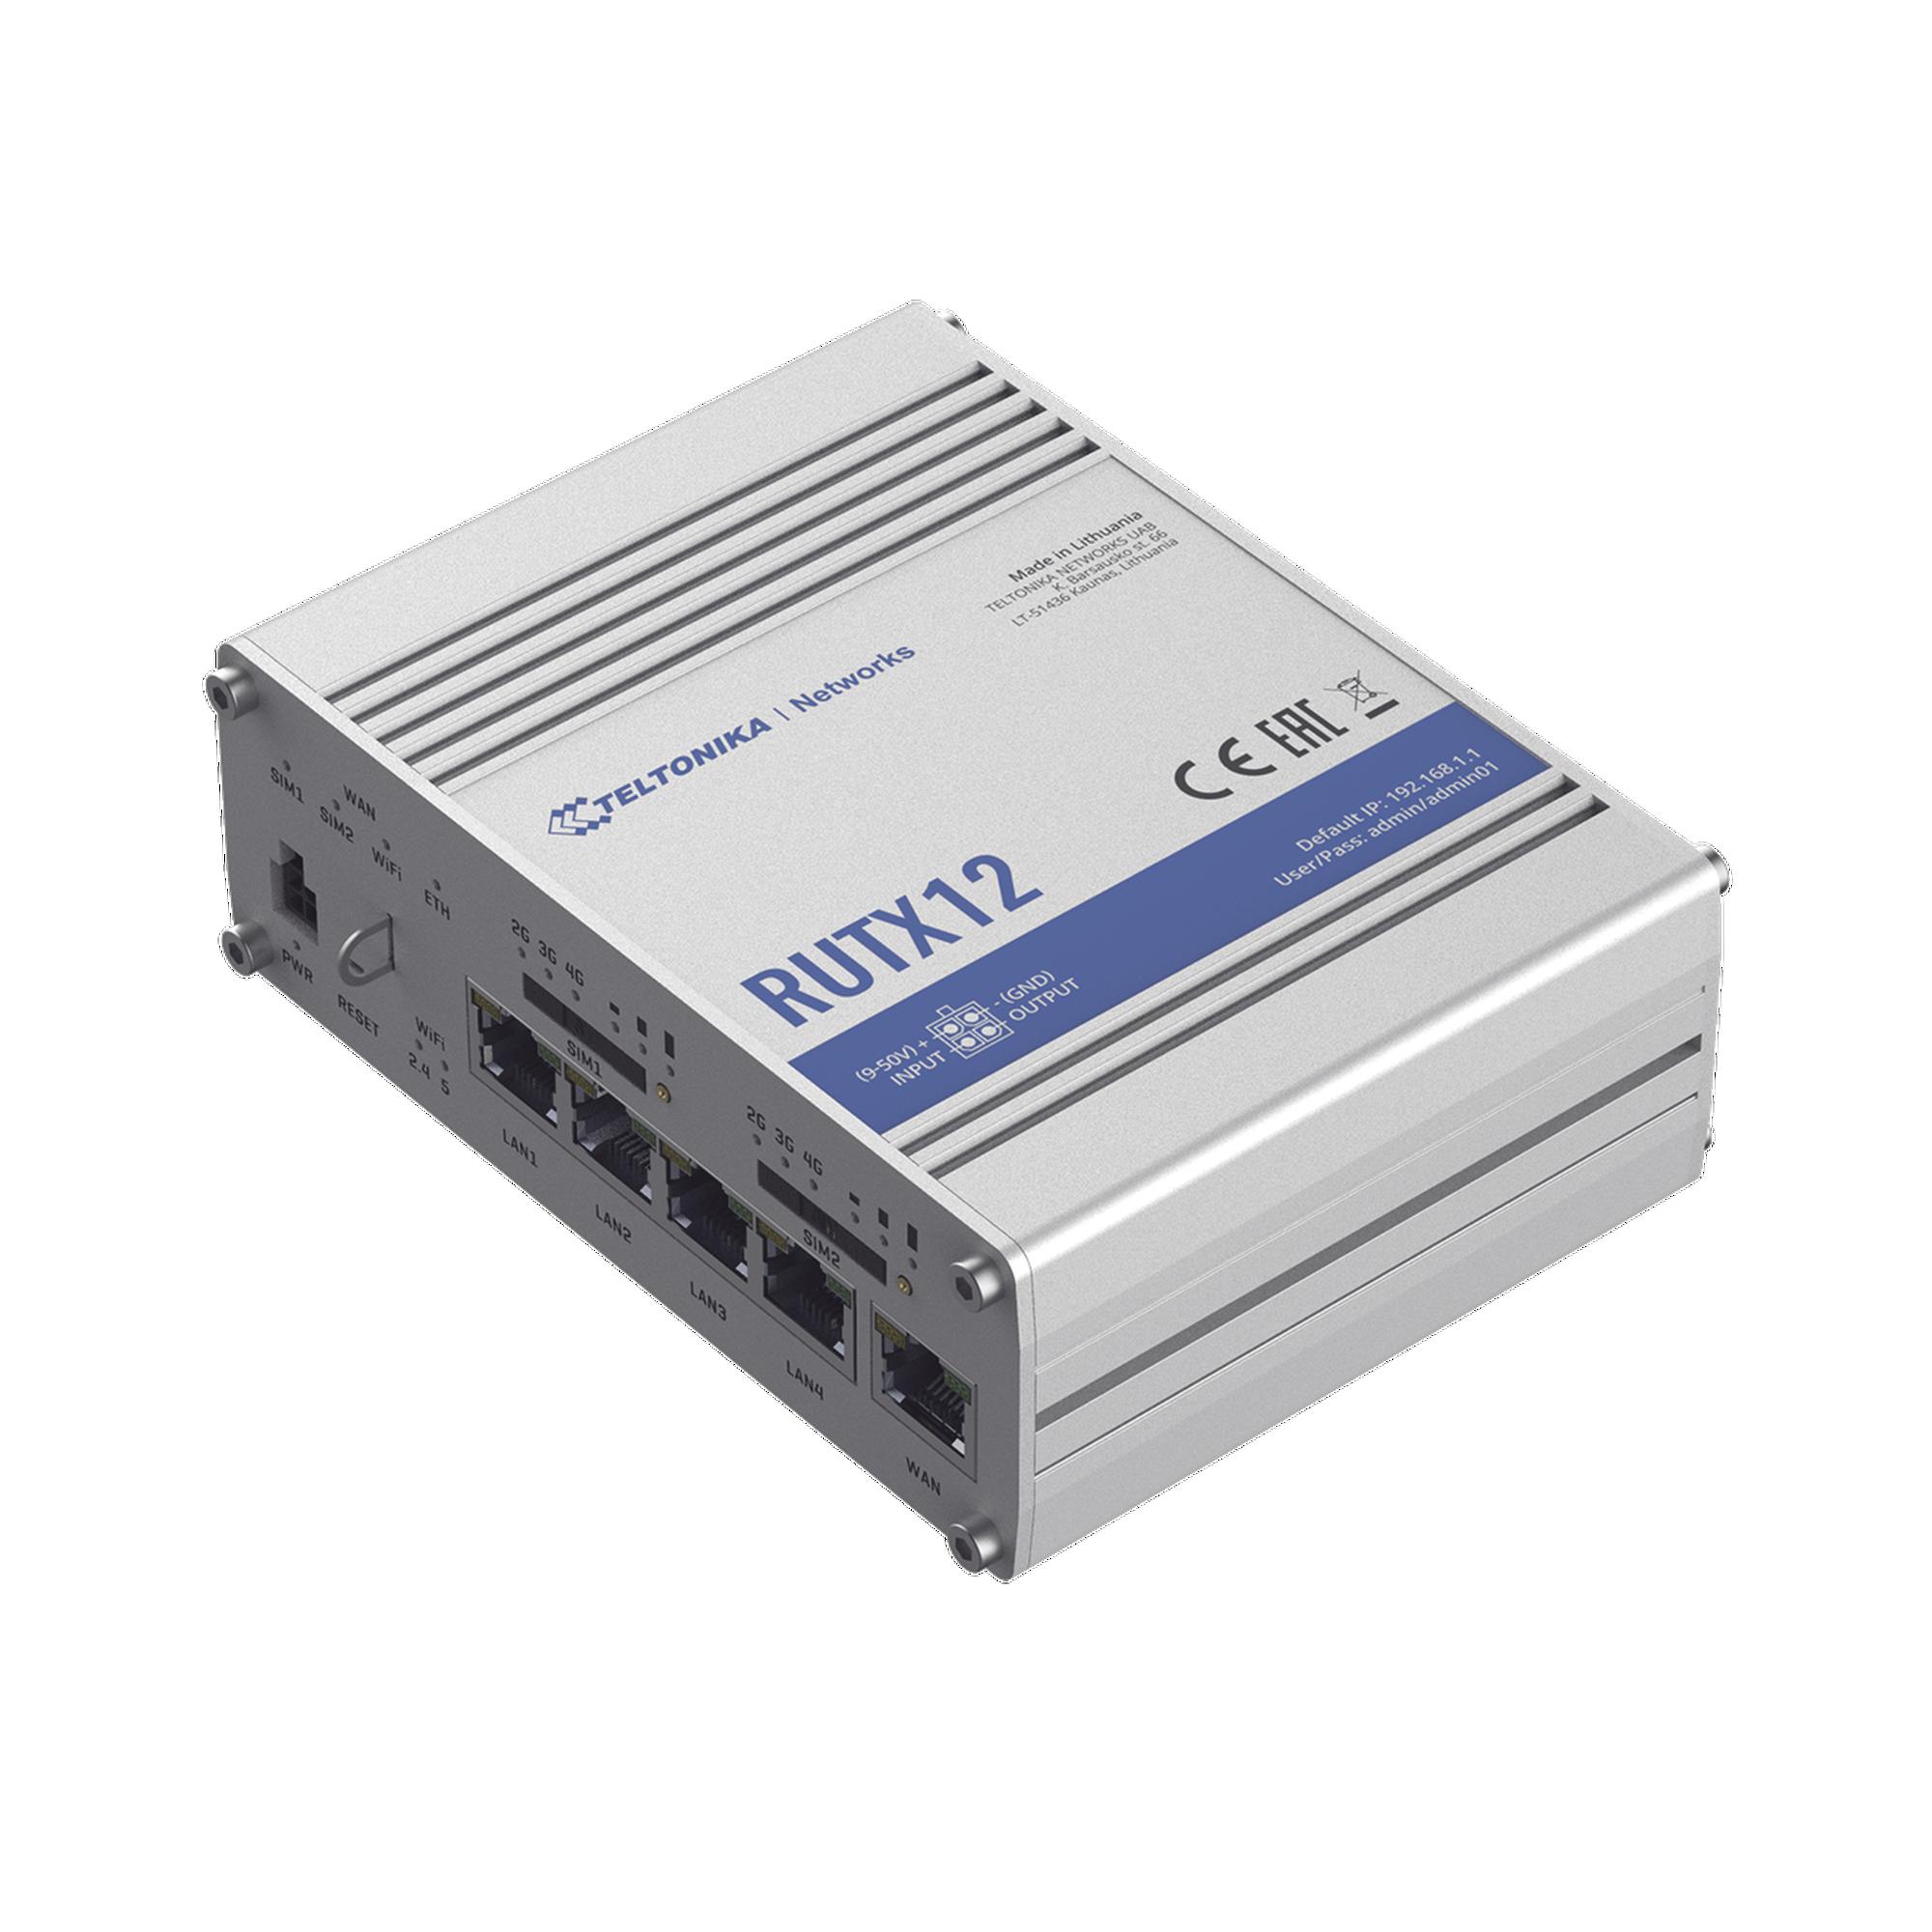 Router Industrial LTE cat 6, Doble Modem y doble SIM, GNSS, carcasa industrial